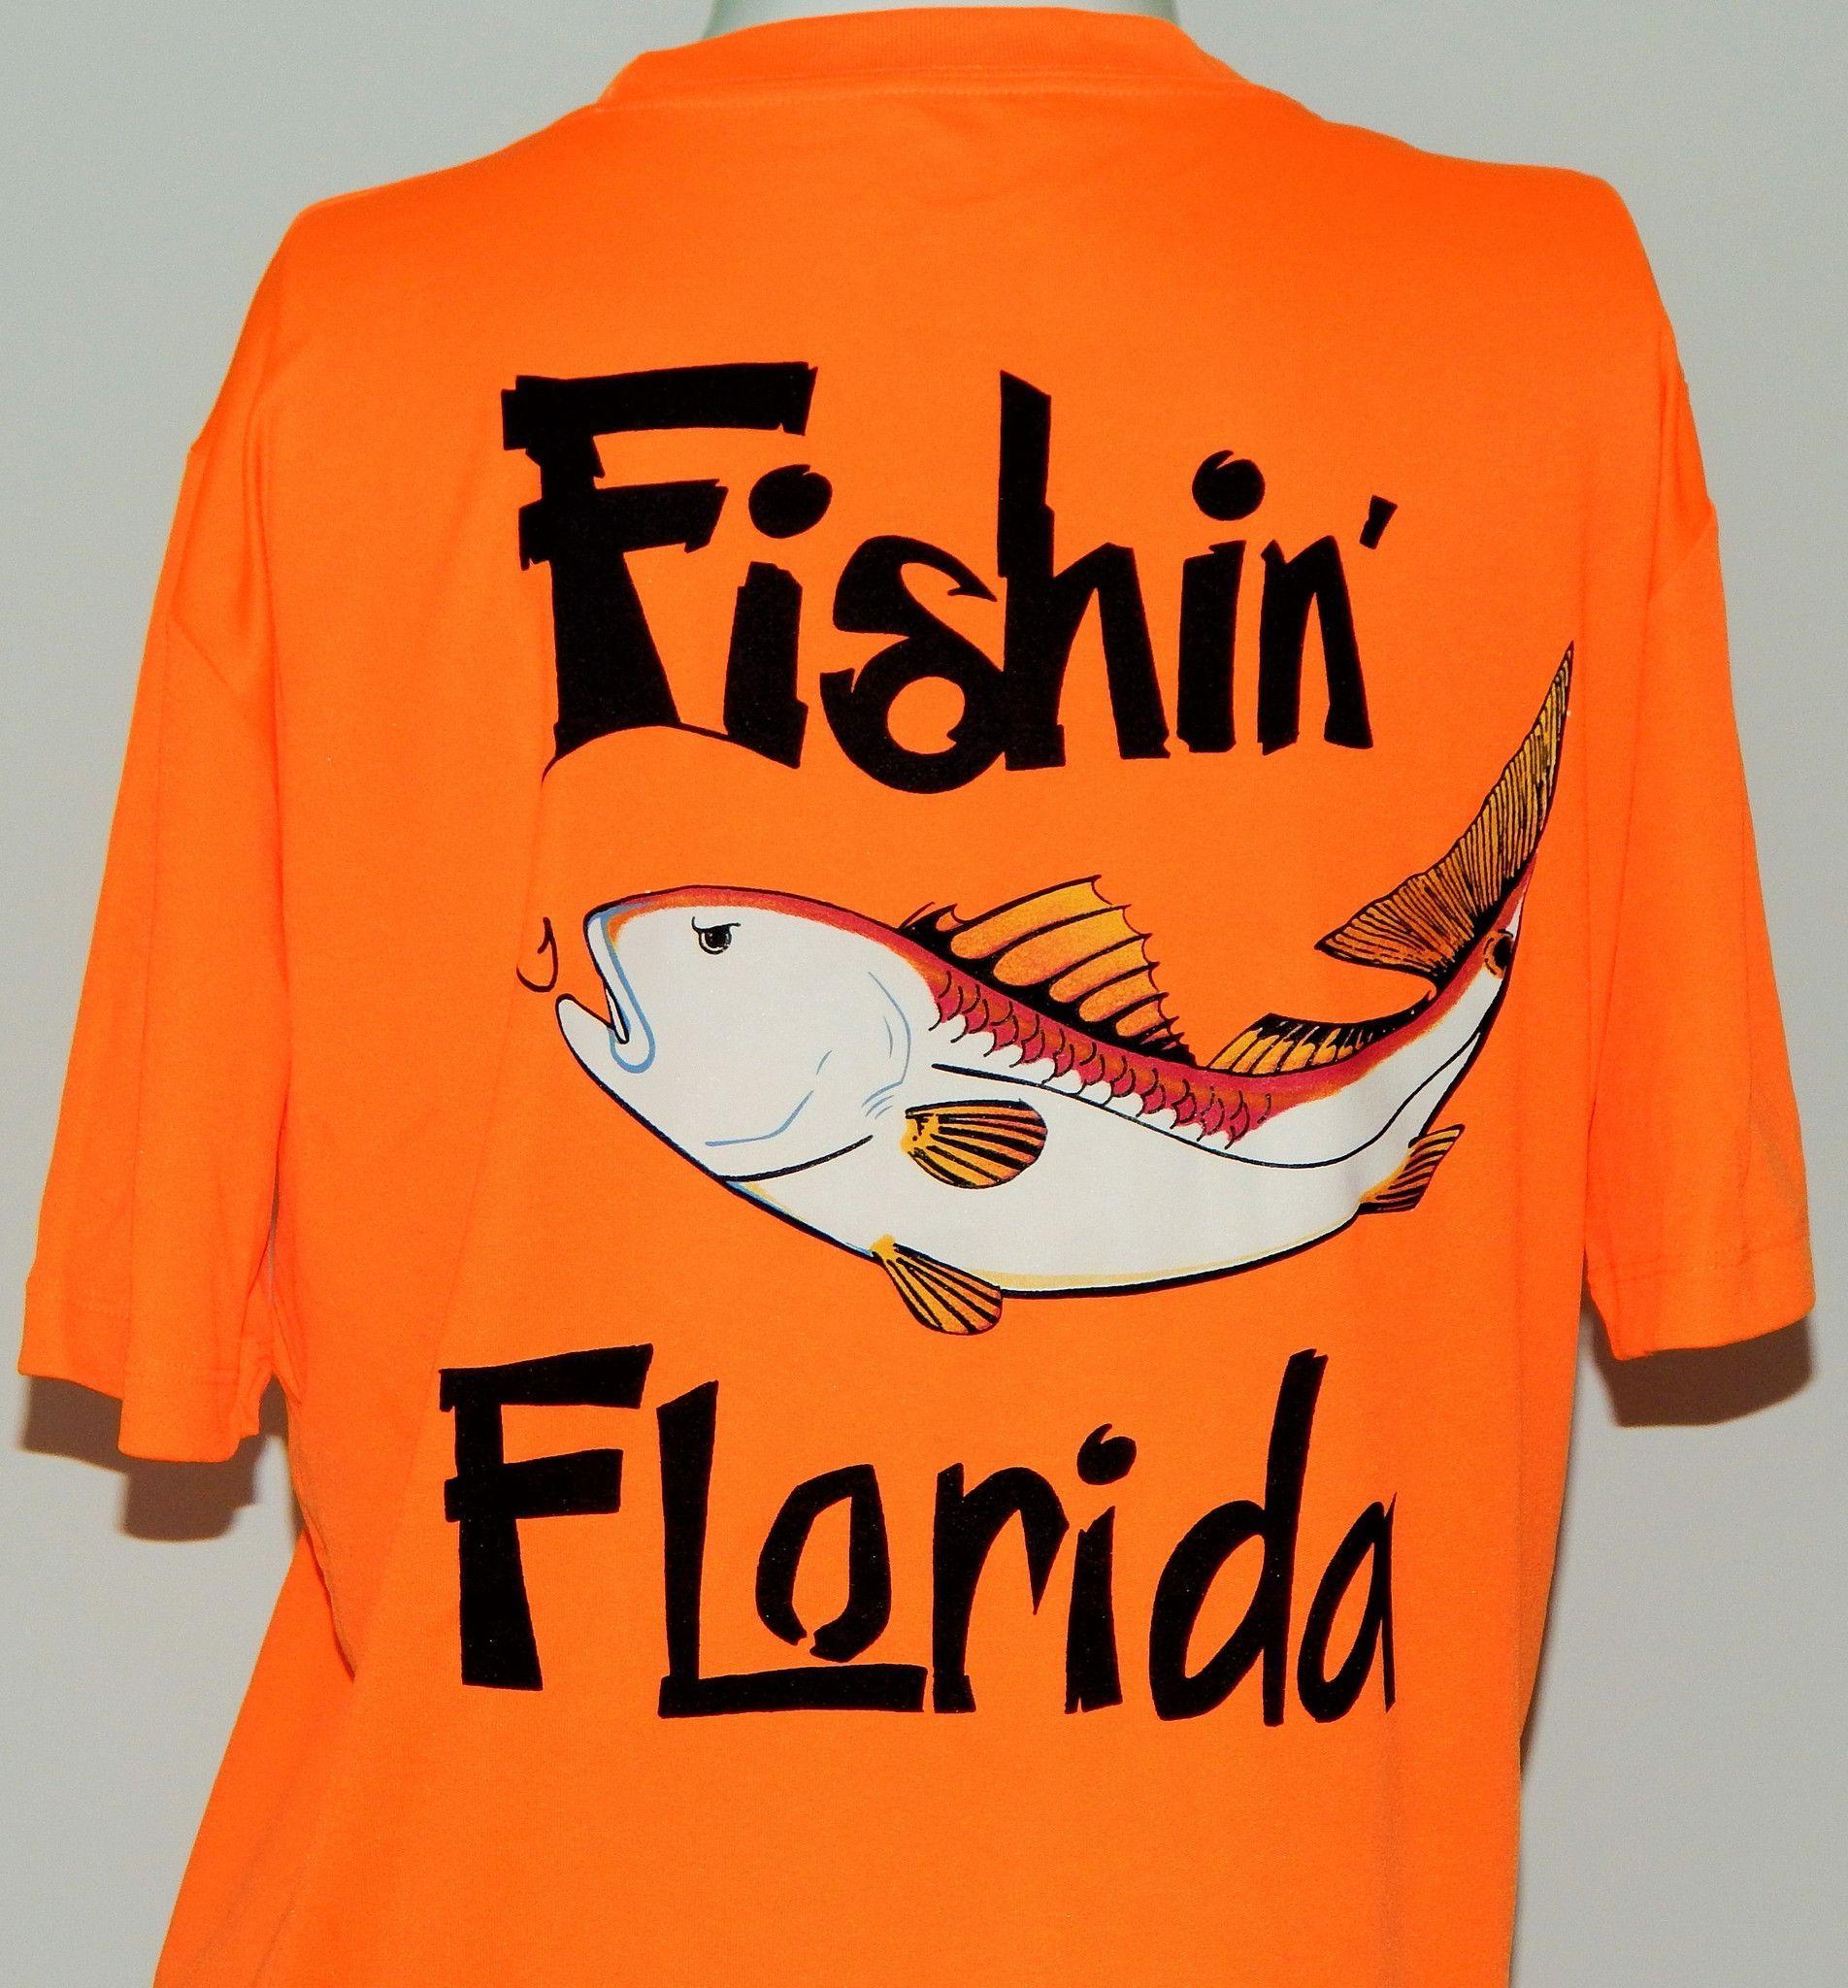 Youth Short Sleeve UPF 50 Dri Fit Performance Shirt: Fishin' Florida Redfish: